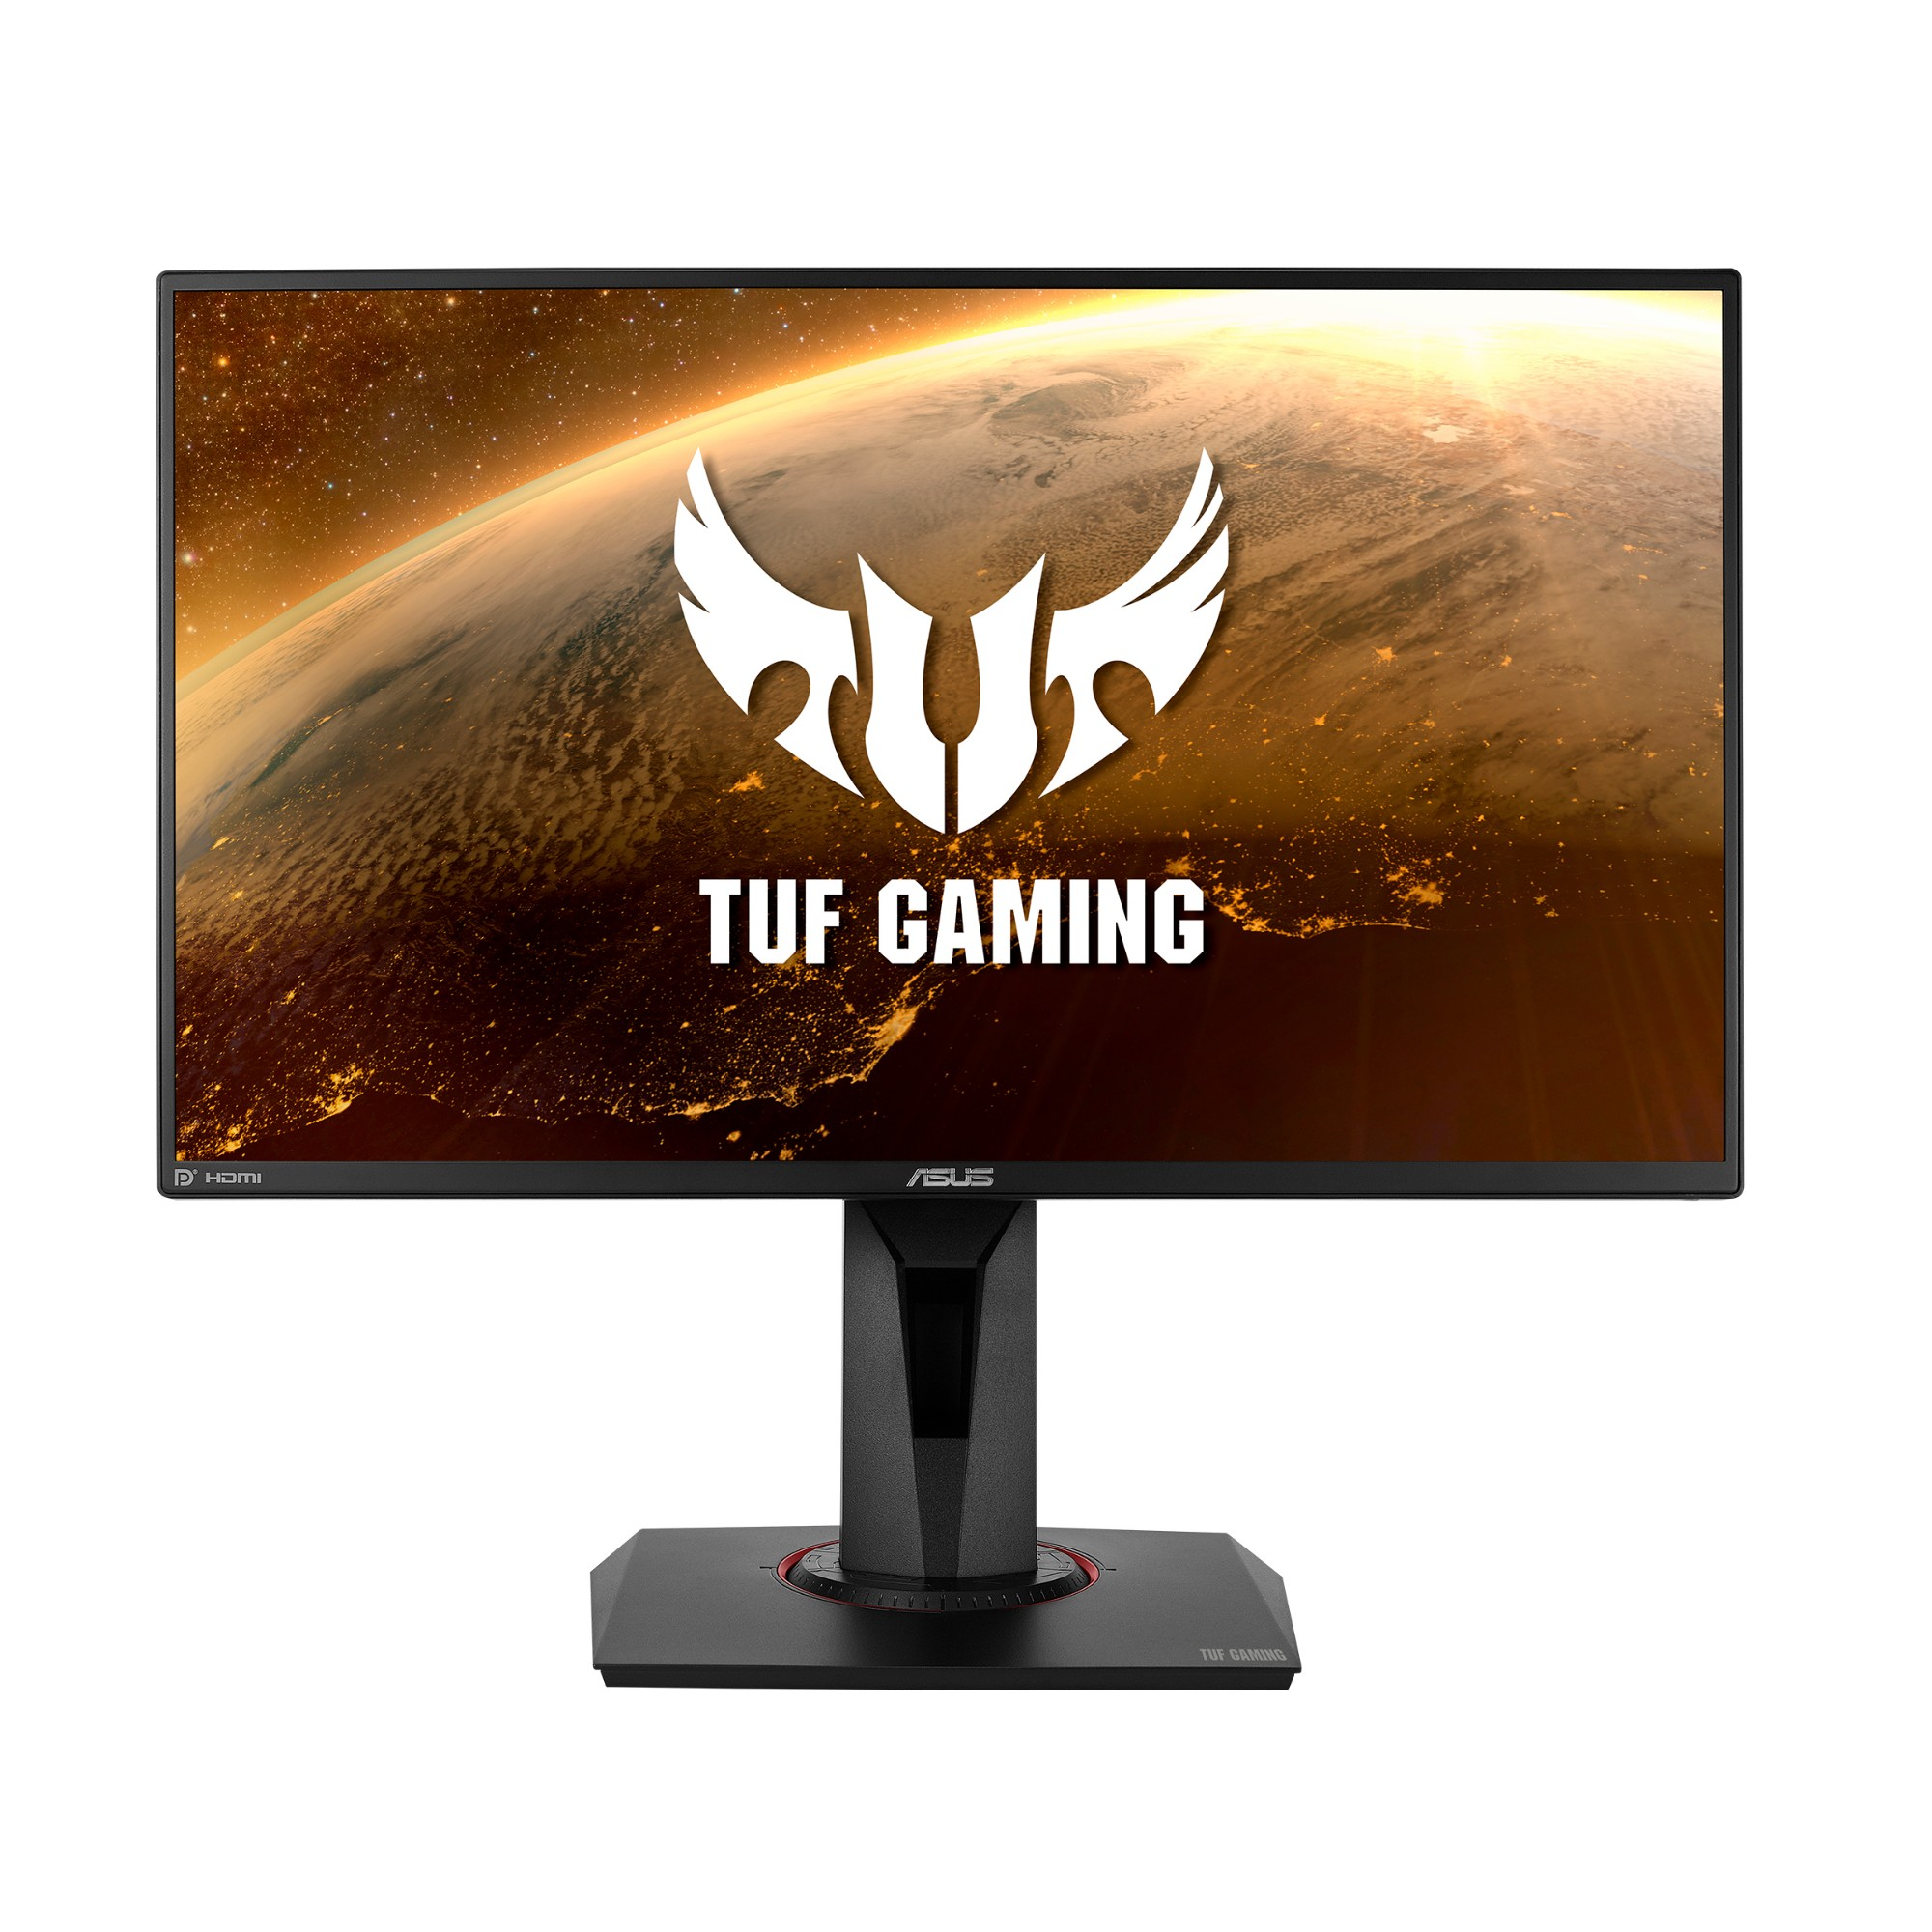 ASUS TUF Gaming VG259QR LED display 62.2 cm (24.5